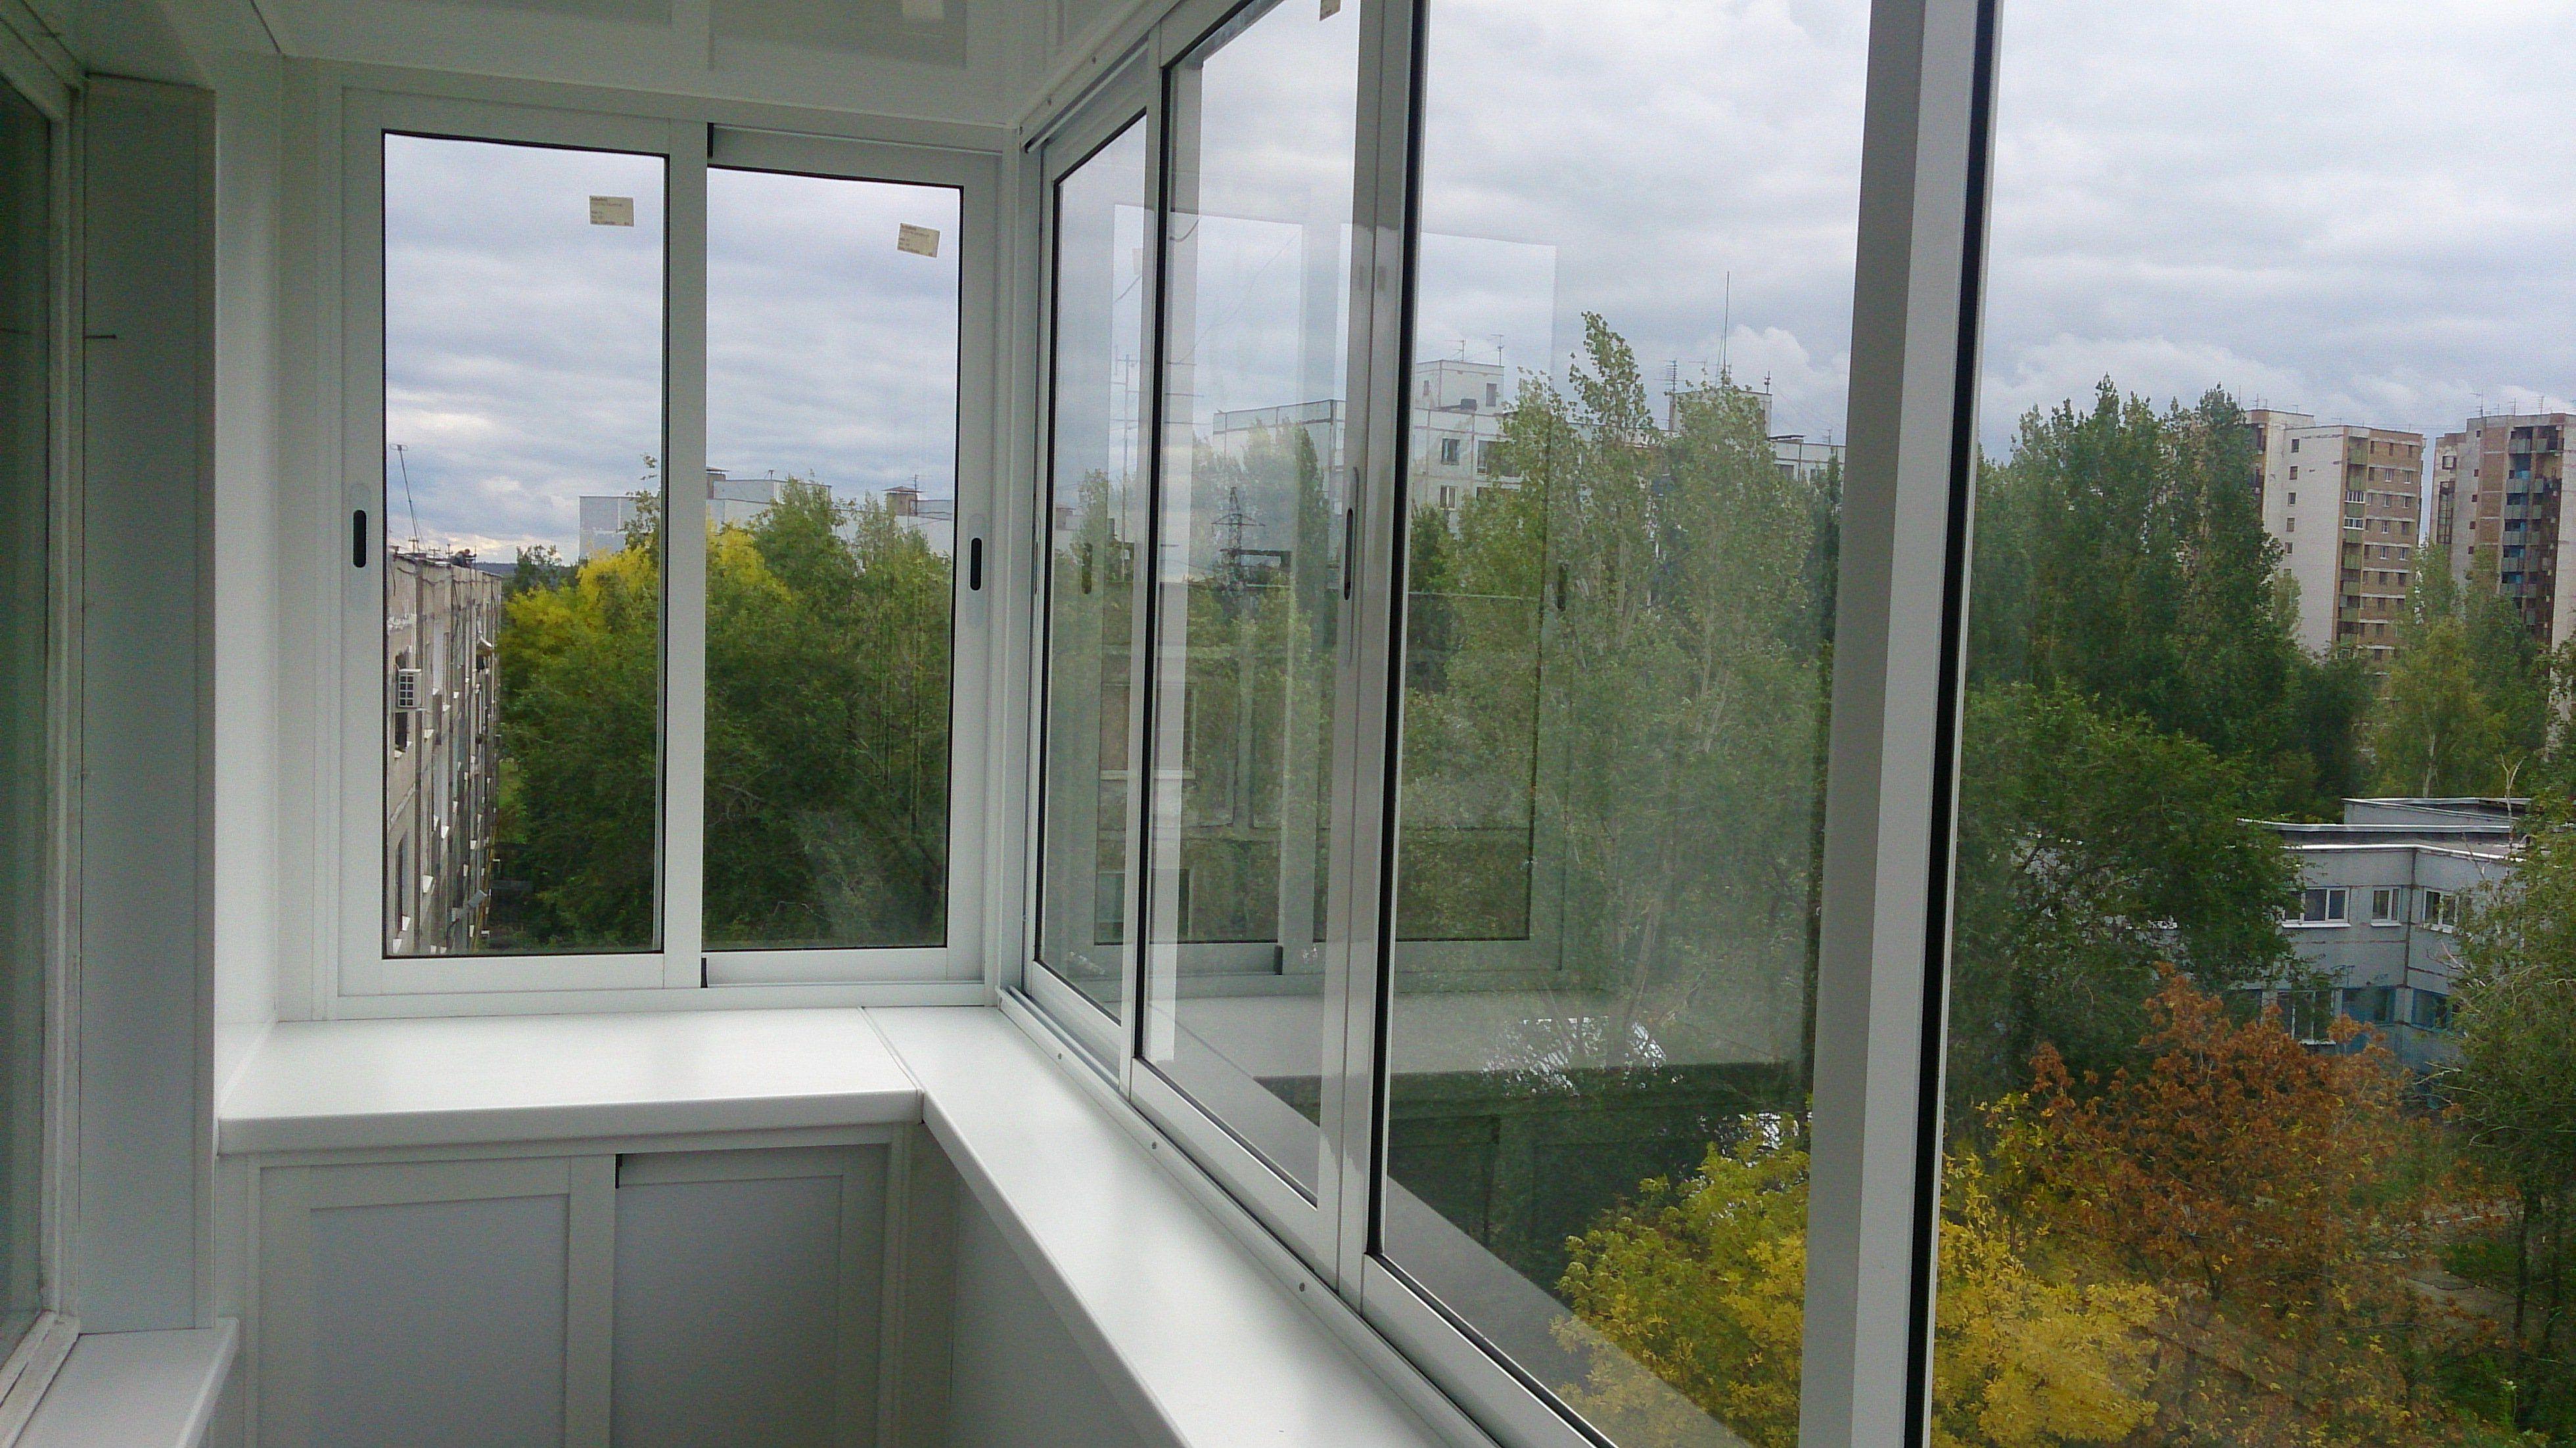 Алюминиевые окна на балкон раздвижные цена фото within 79 вд.